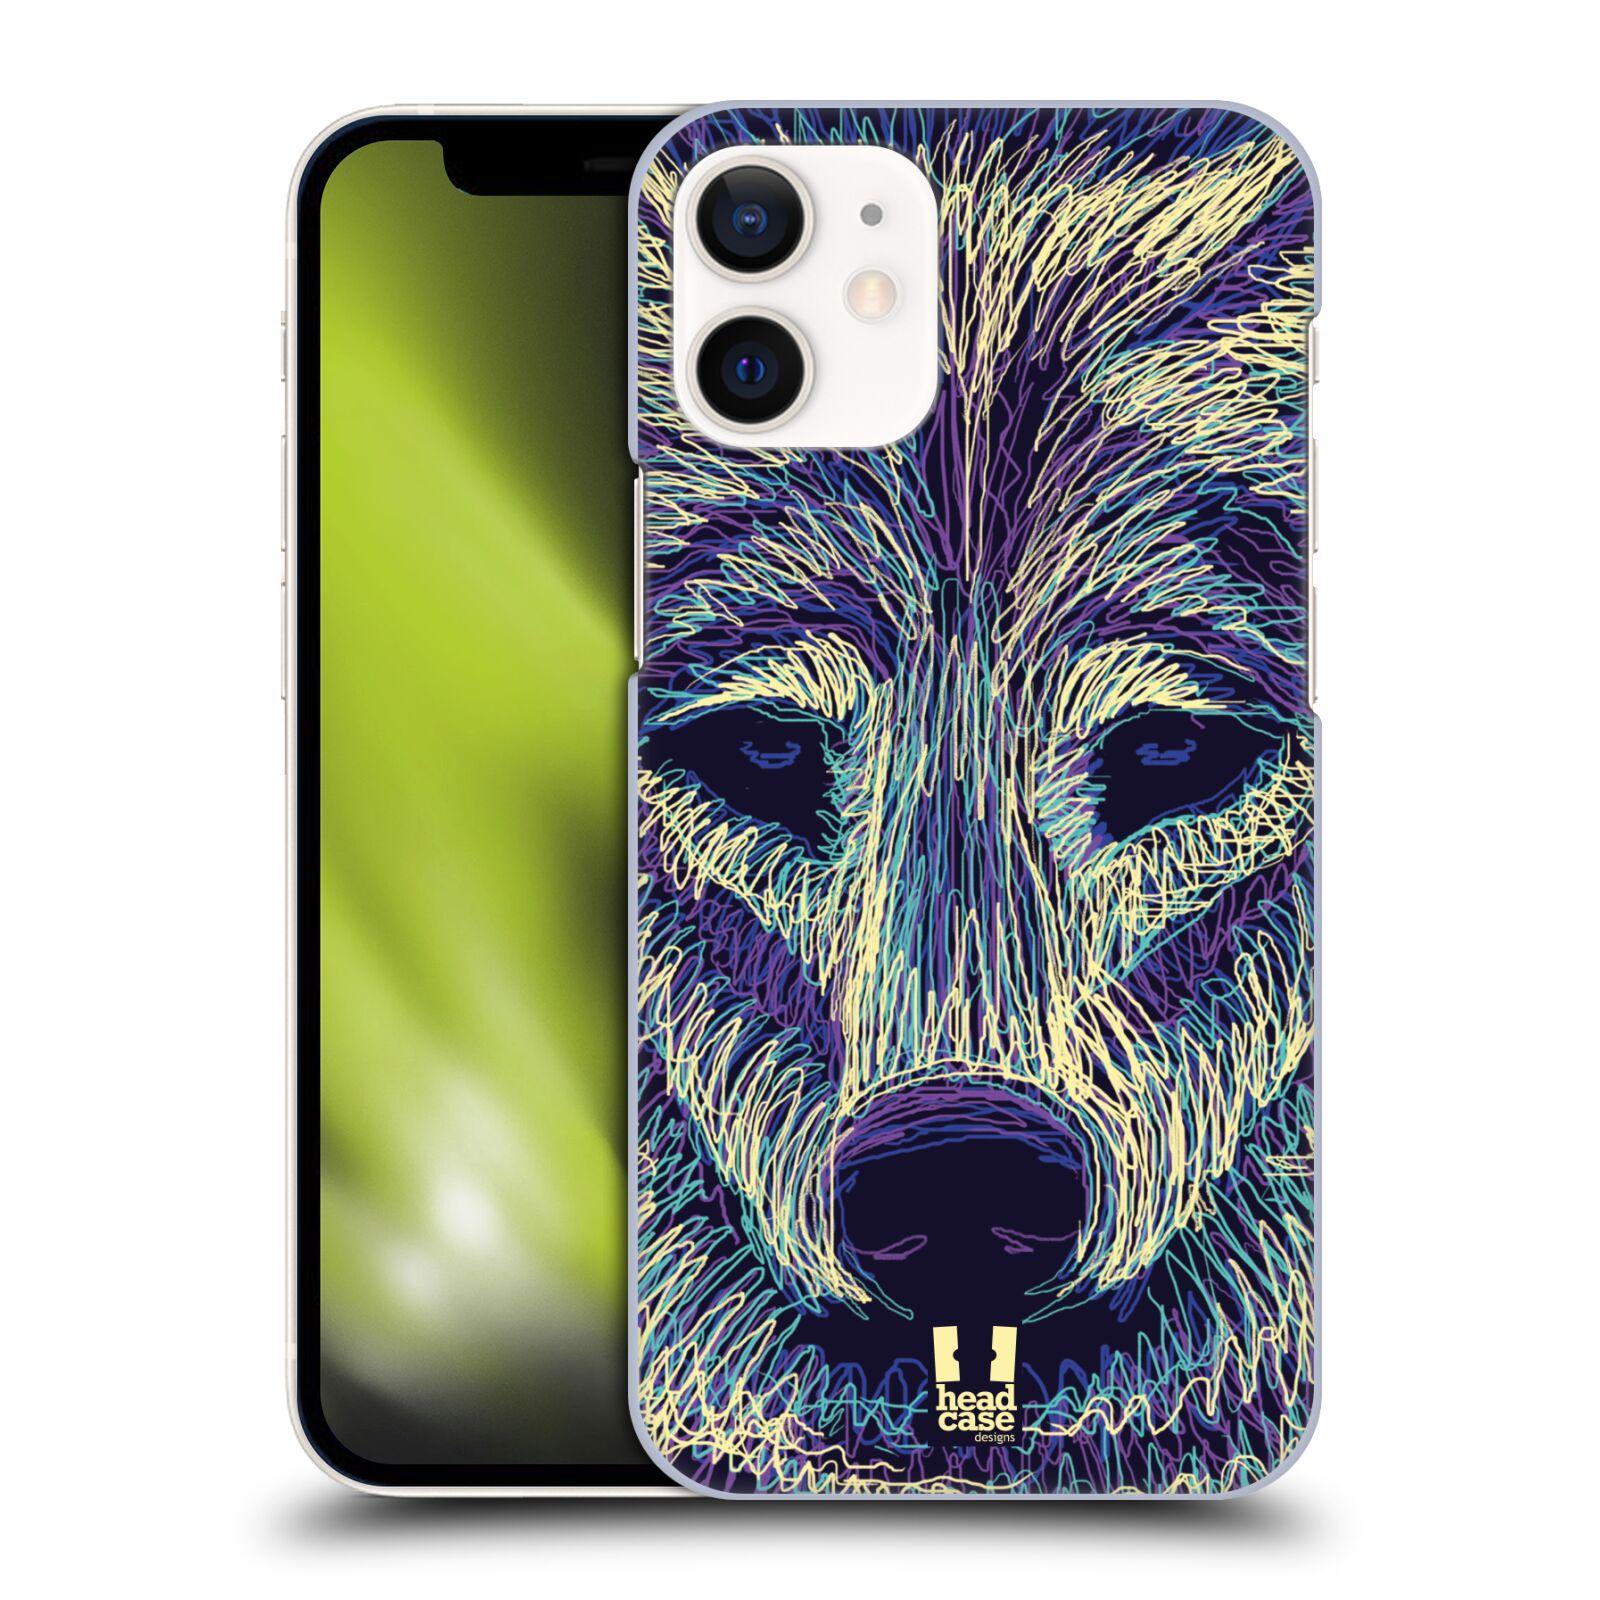 Plastový obal na mobil Apple Iphone 12 MINI vzor zvíře čmáranice vlk